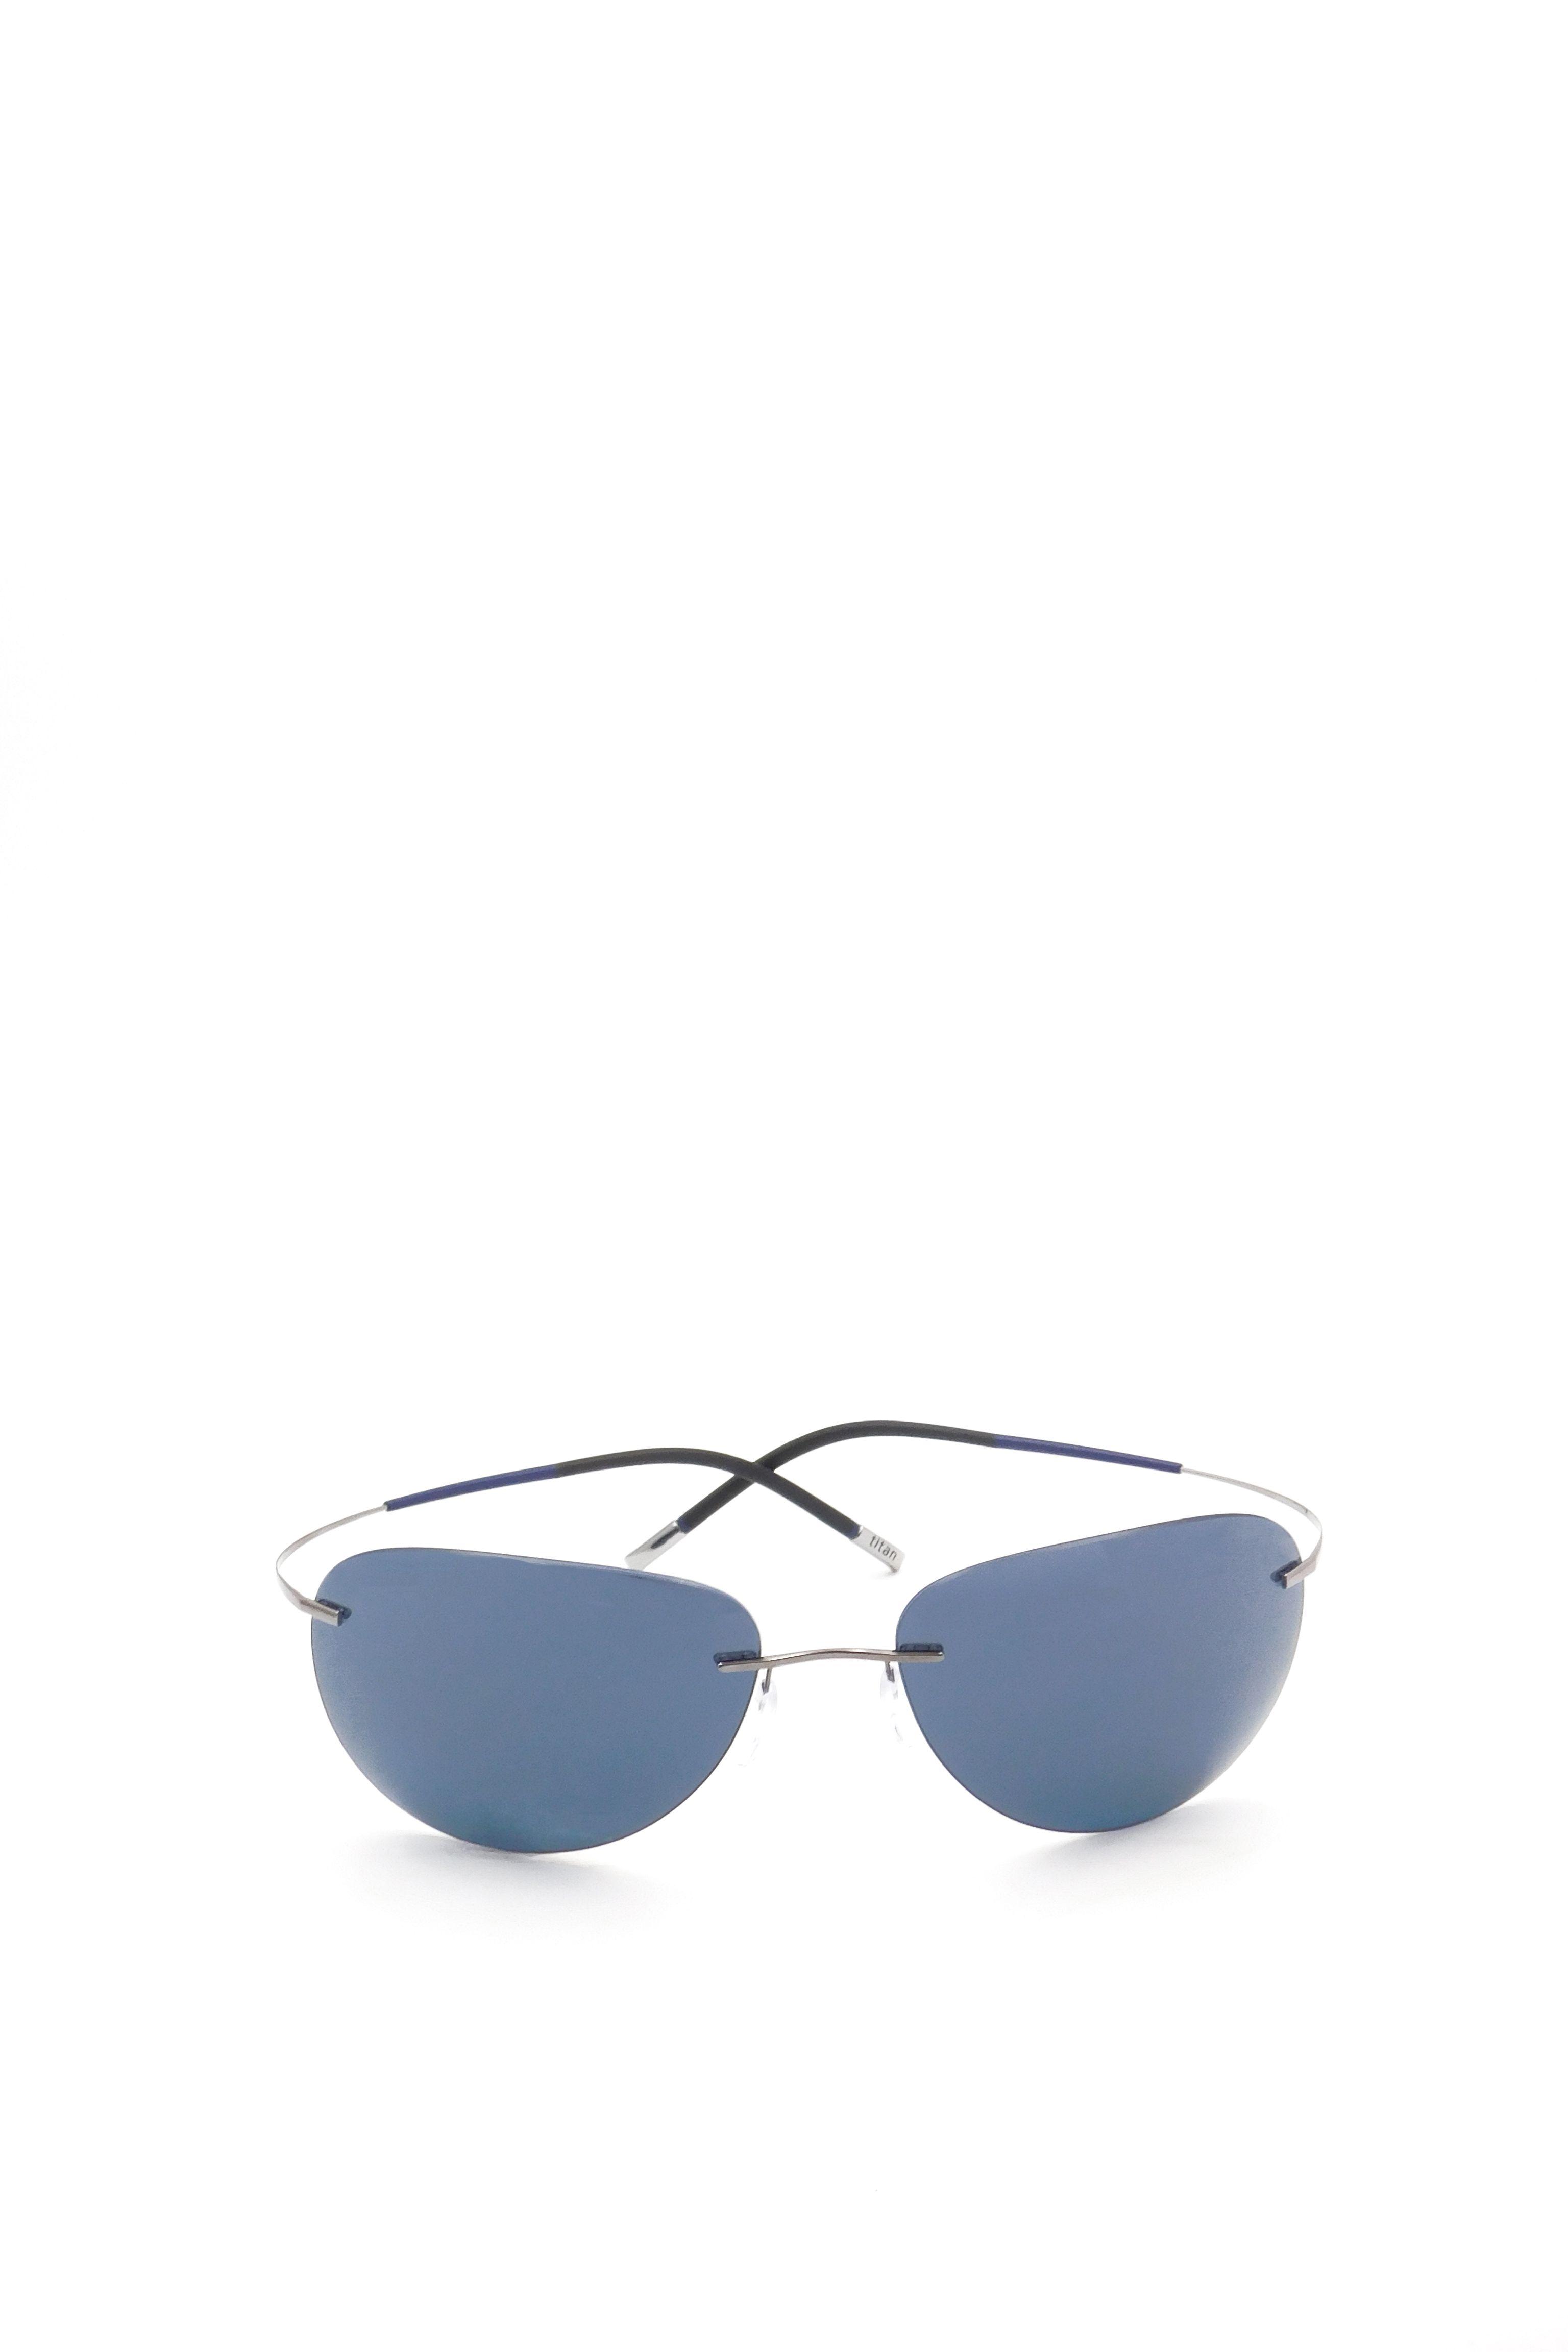 Silhouette Sunglasses SILVER METAL SUNGLASSES